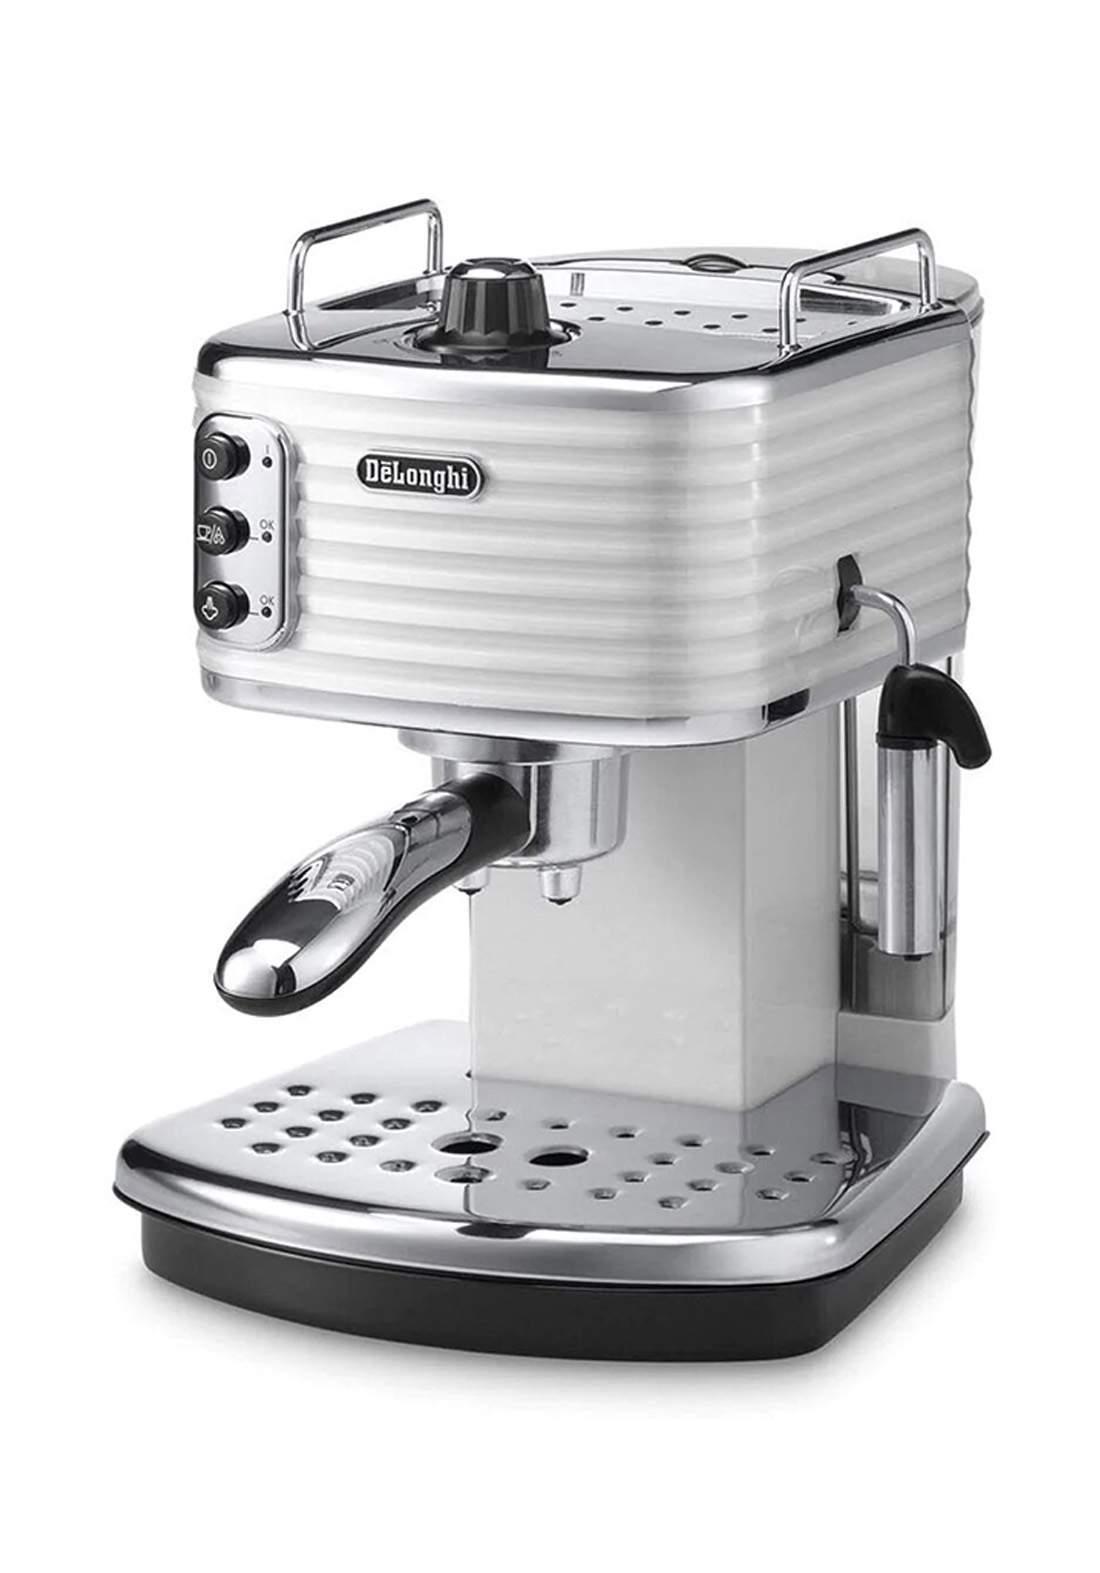 Delonghi ECZ351.BG Coffee Machine 1100 Watt ماكنة صنع قهوة